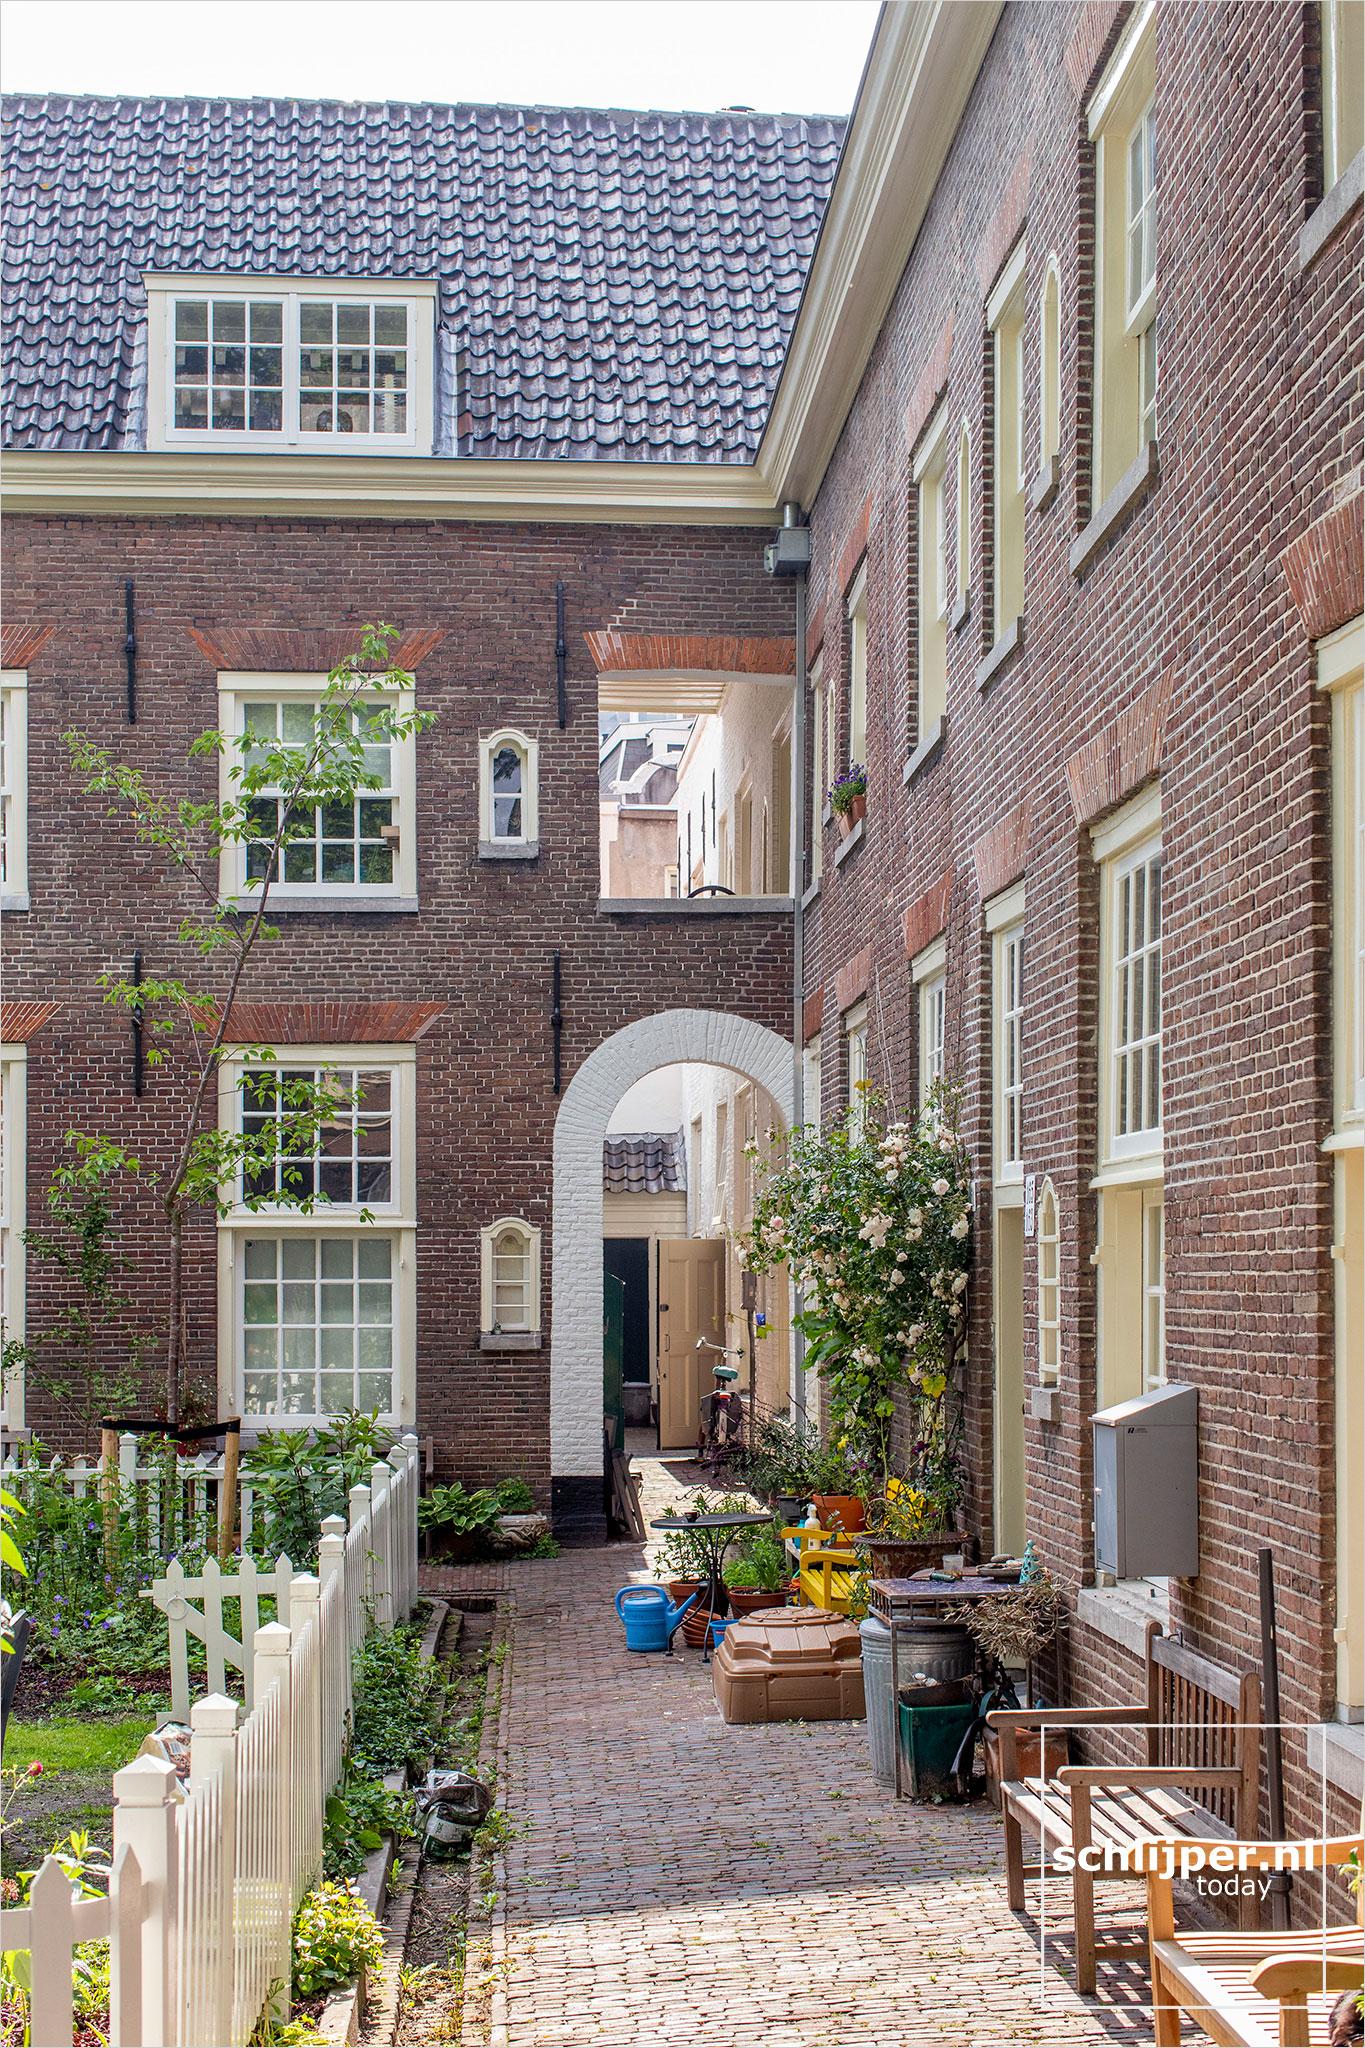 Nederland, Amsterdam, 11 juni 2020